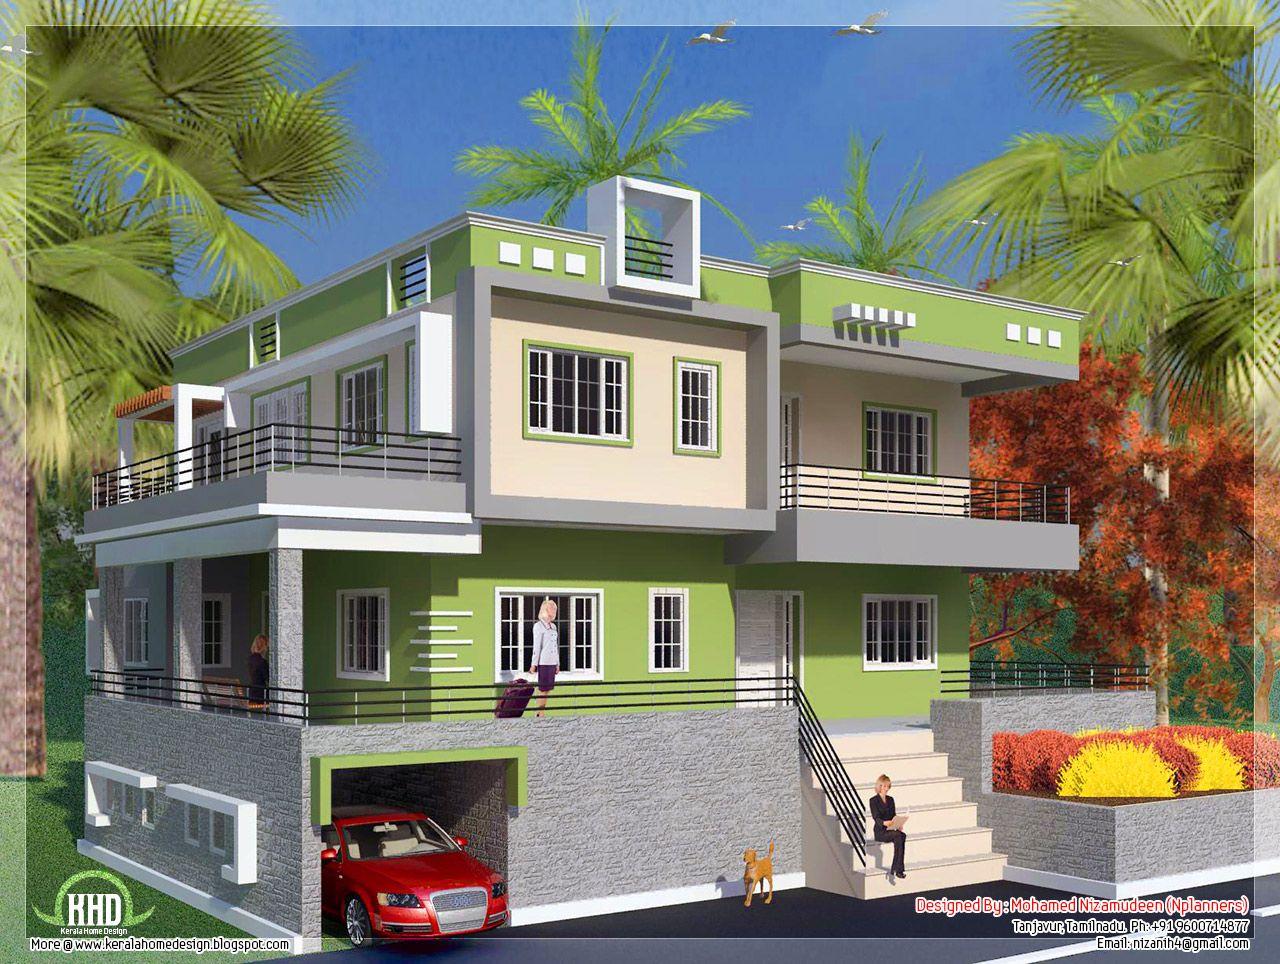 50 Desain Rumah Minimalis 2 Lantai Modern Terbaru House Exterior House Designs Exterior House Front Wall Design